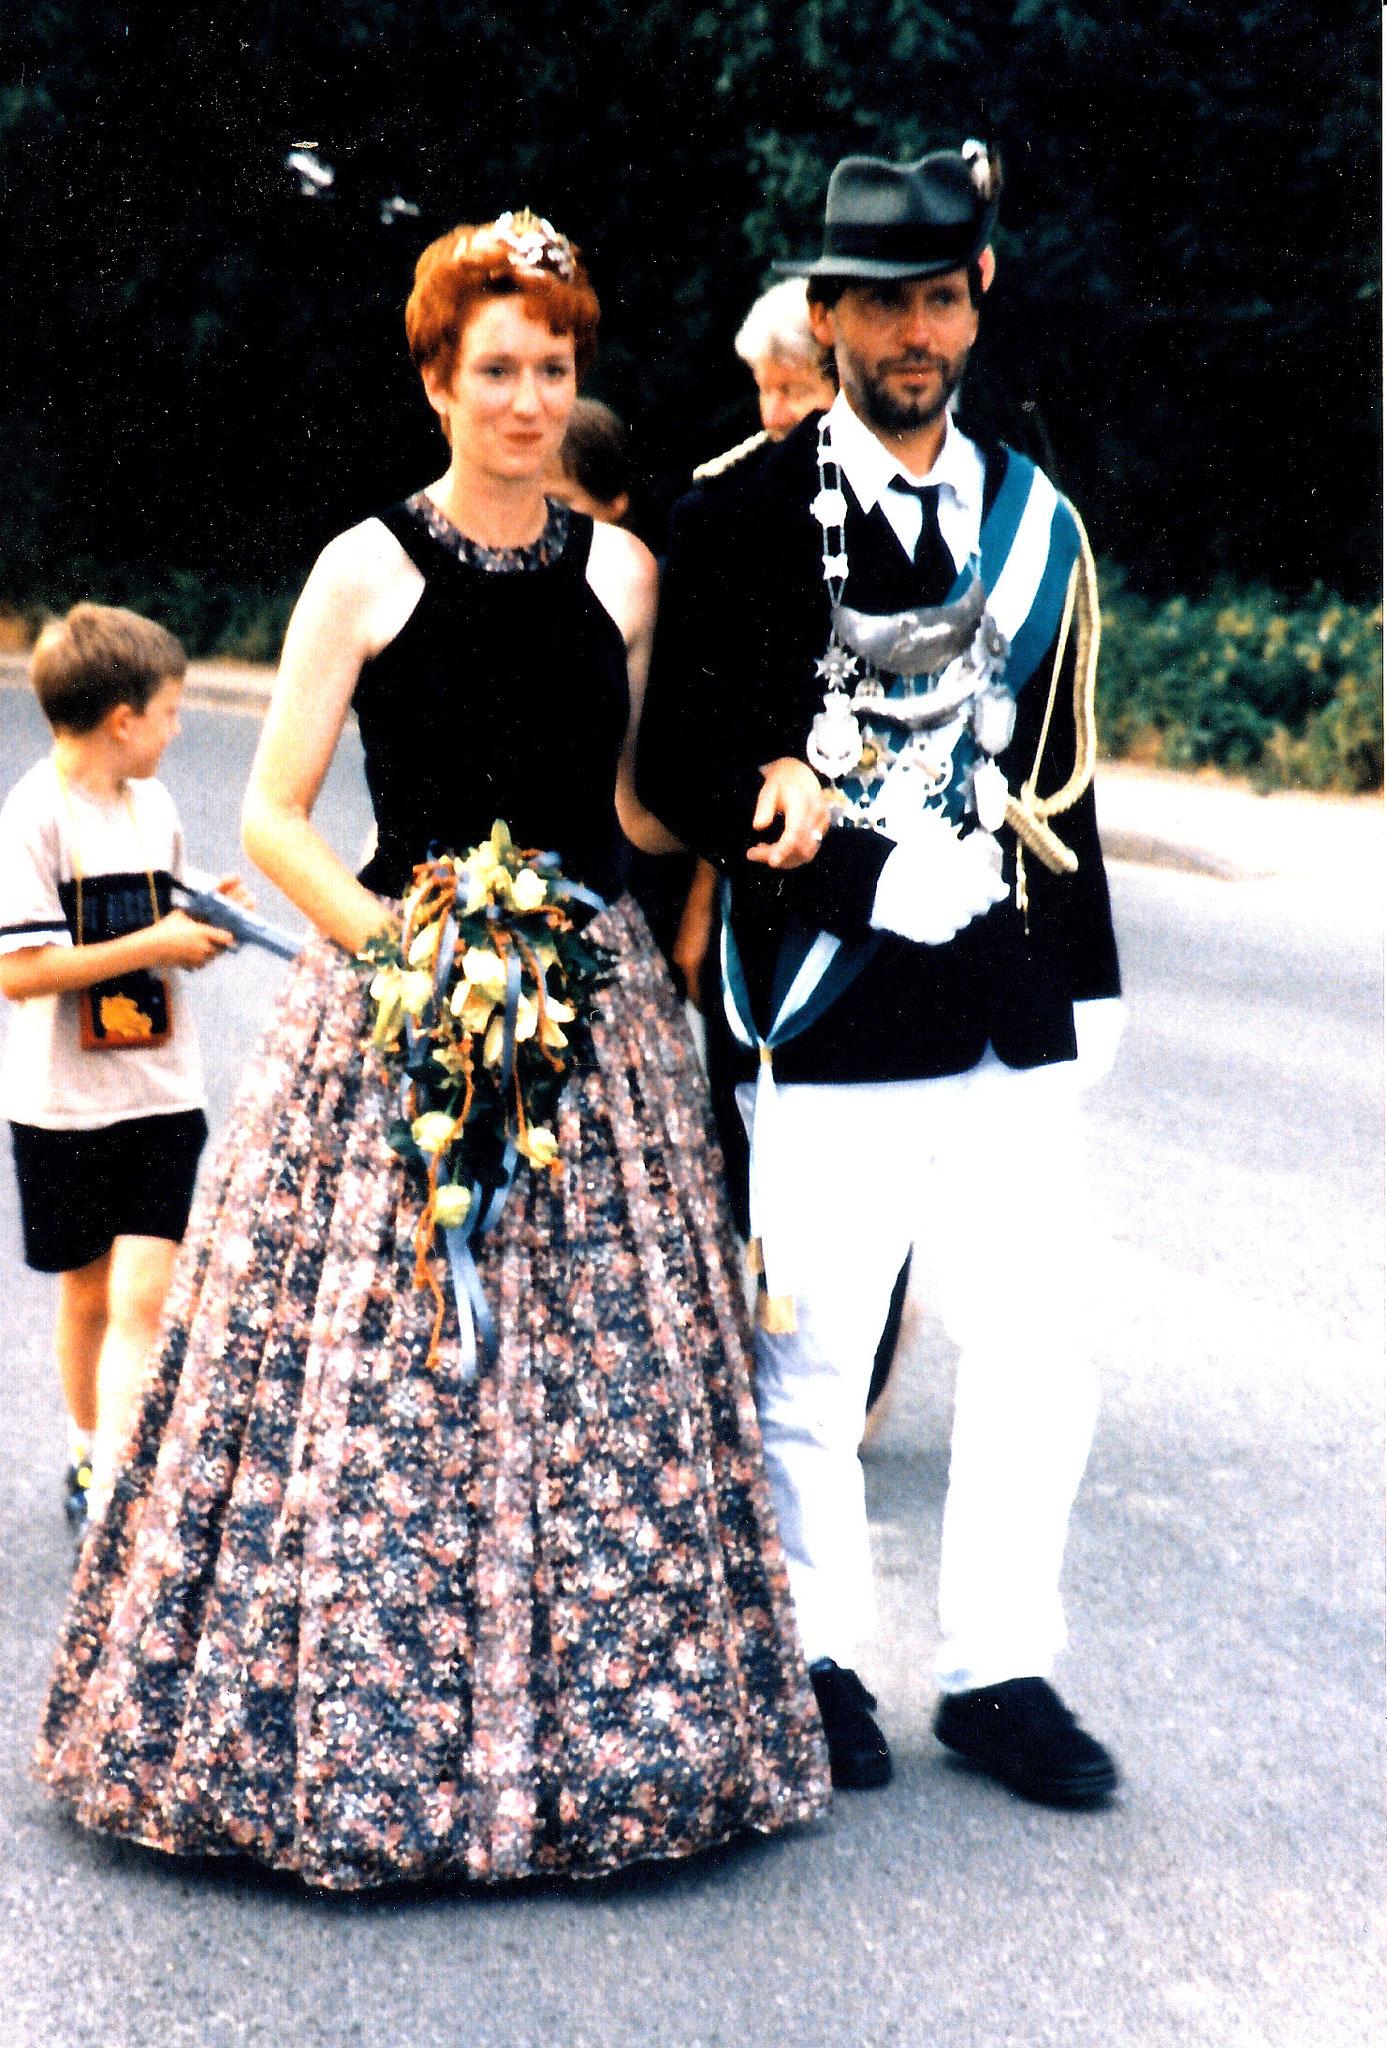 1999 Günter Lötte & Martina Cramer